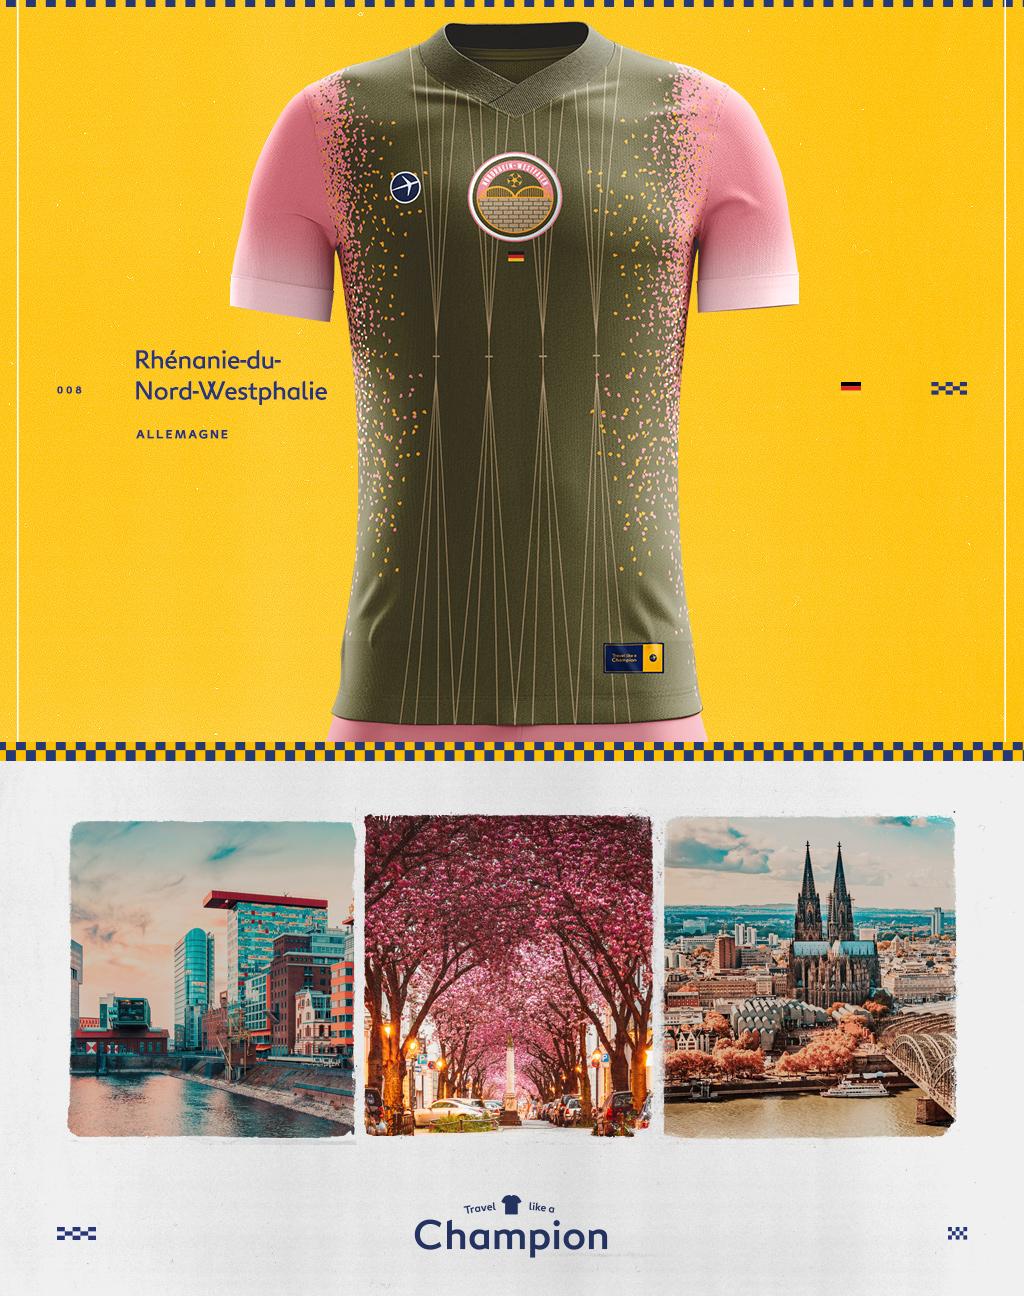 008-nordrhein-blog-article-1024x1296-fr.jpg?1556232069